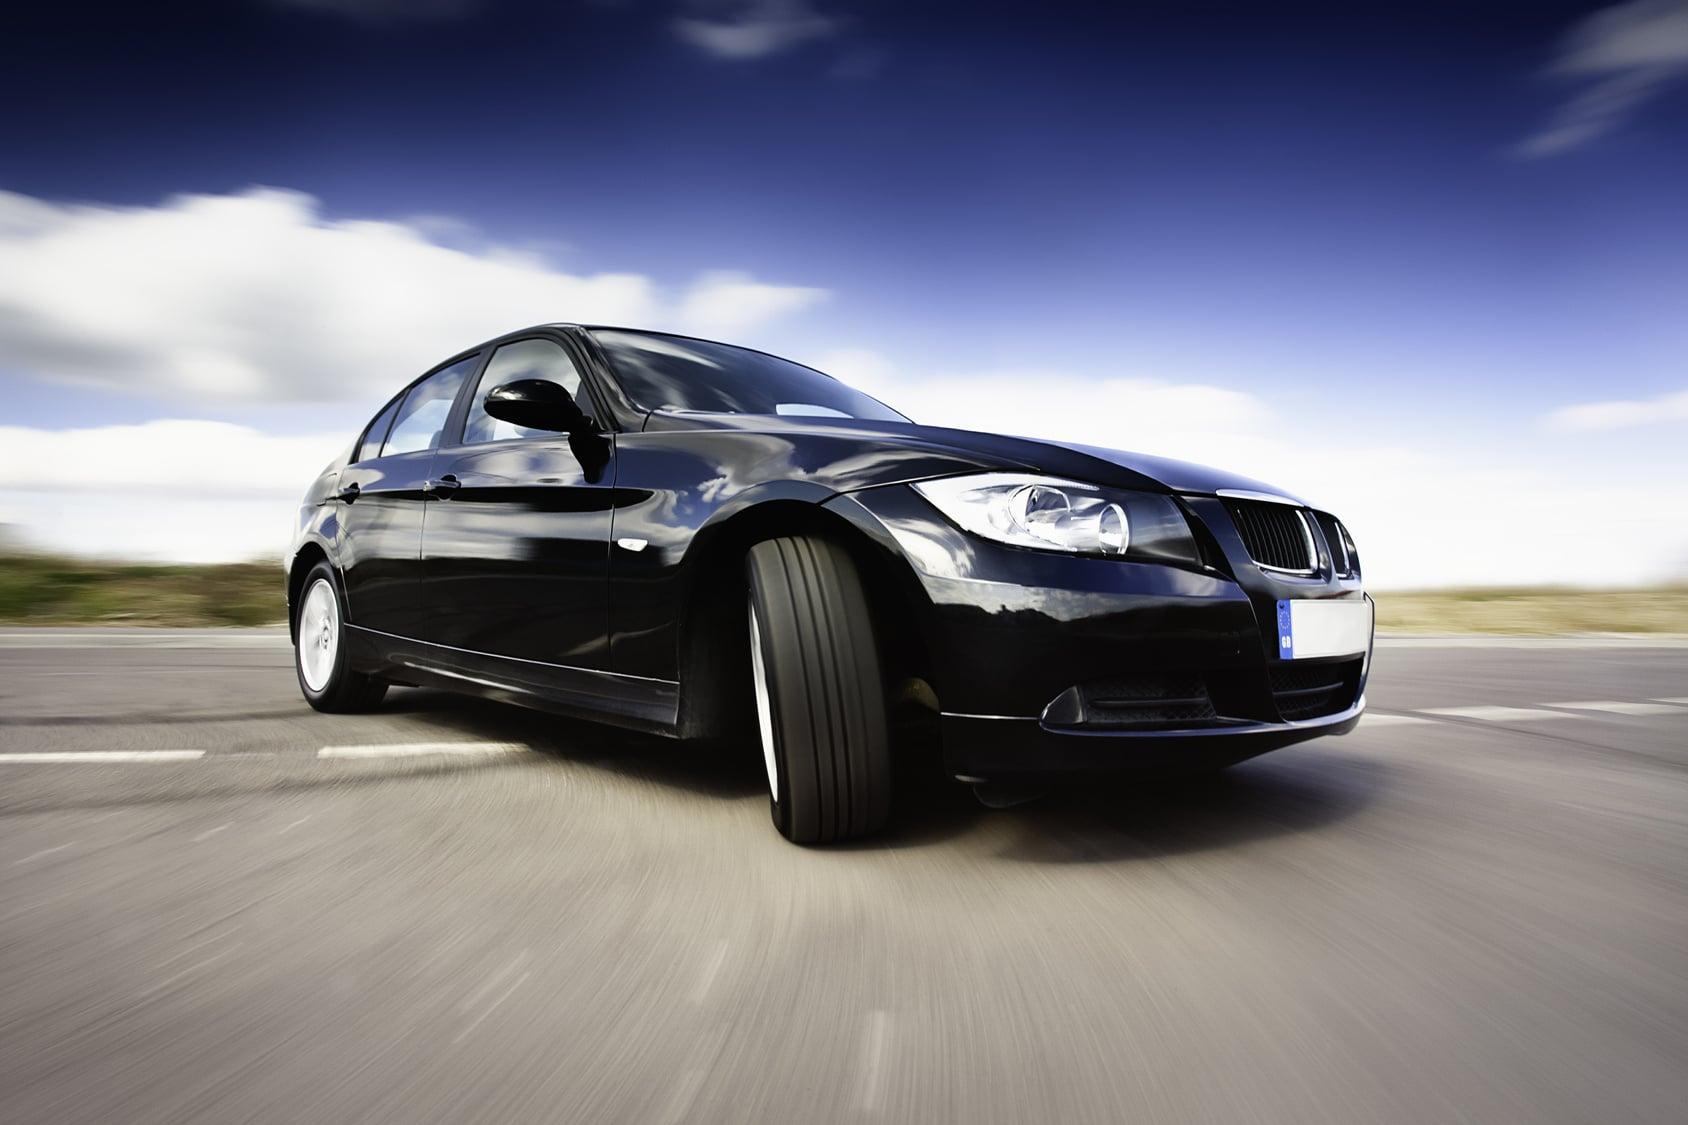 BMW Repair Service - Master Automotive Repair